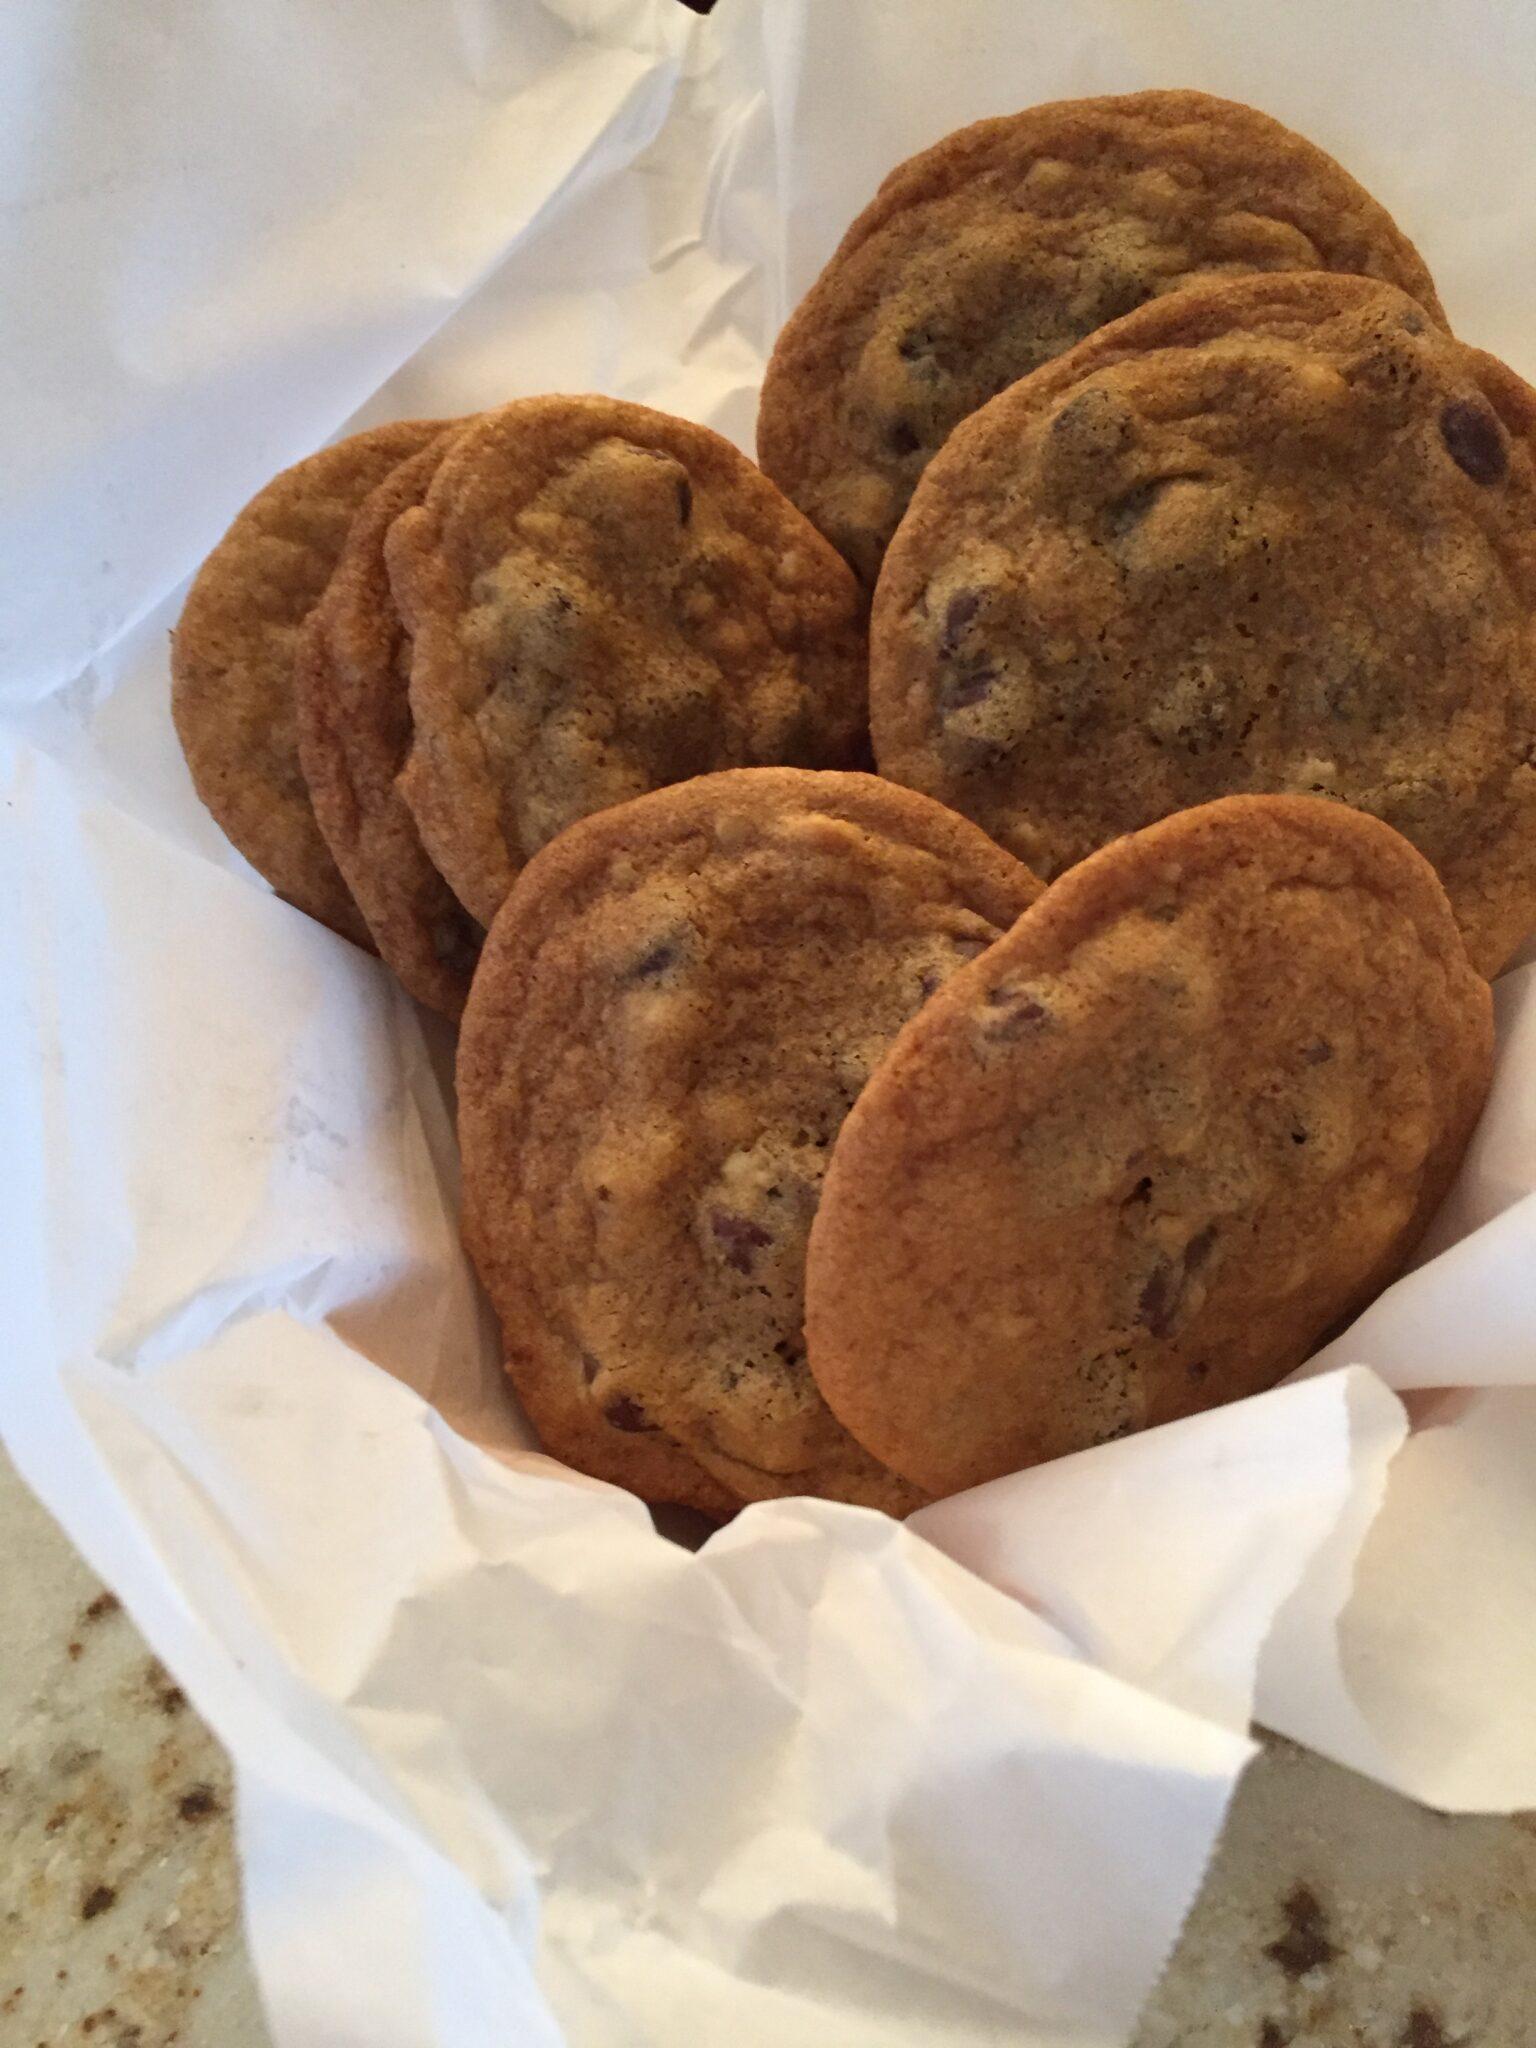 Nestle's Chocolate Chip Cookies